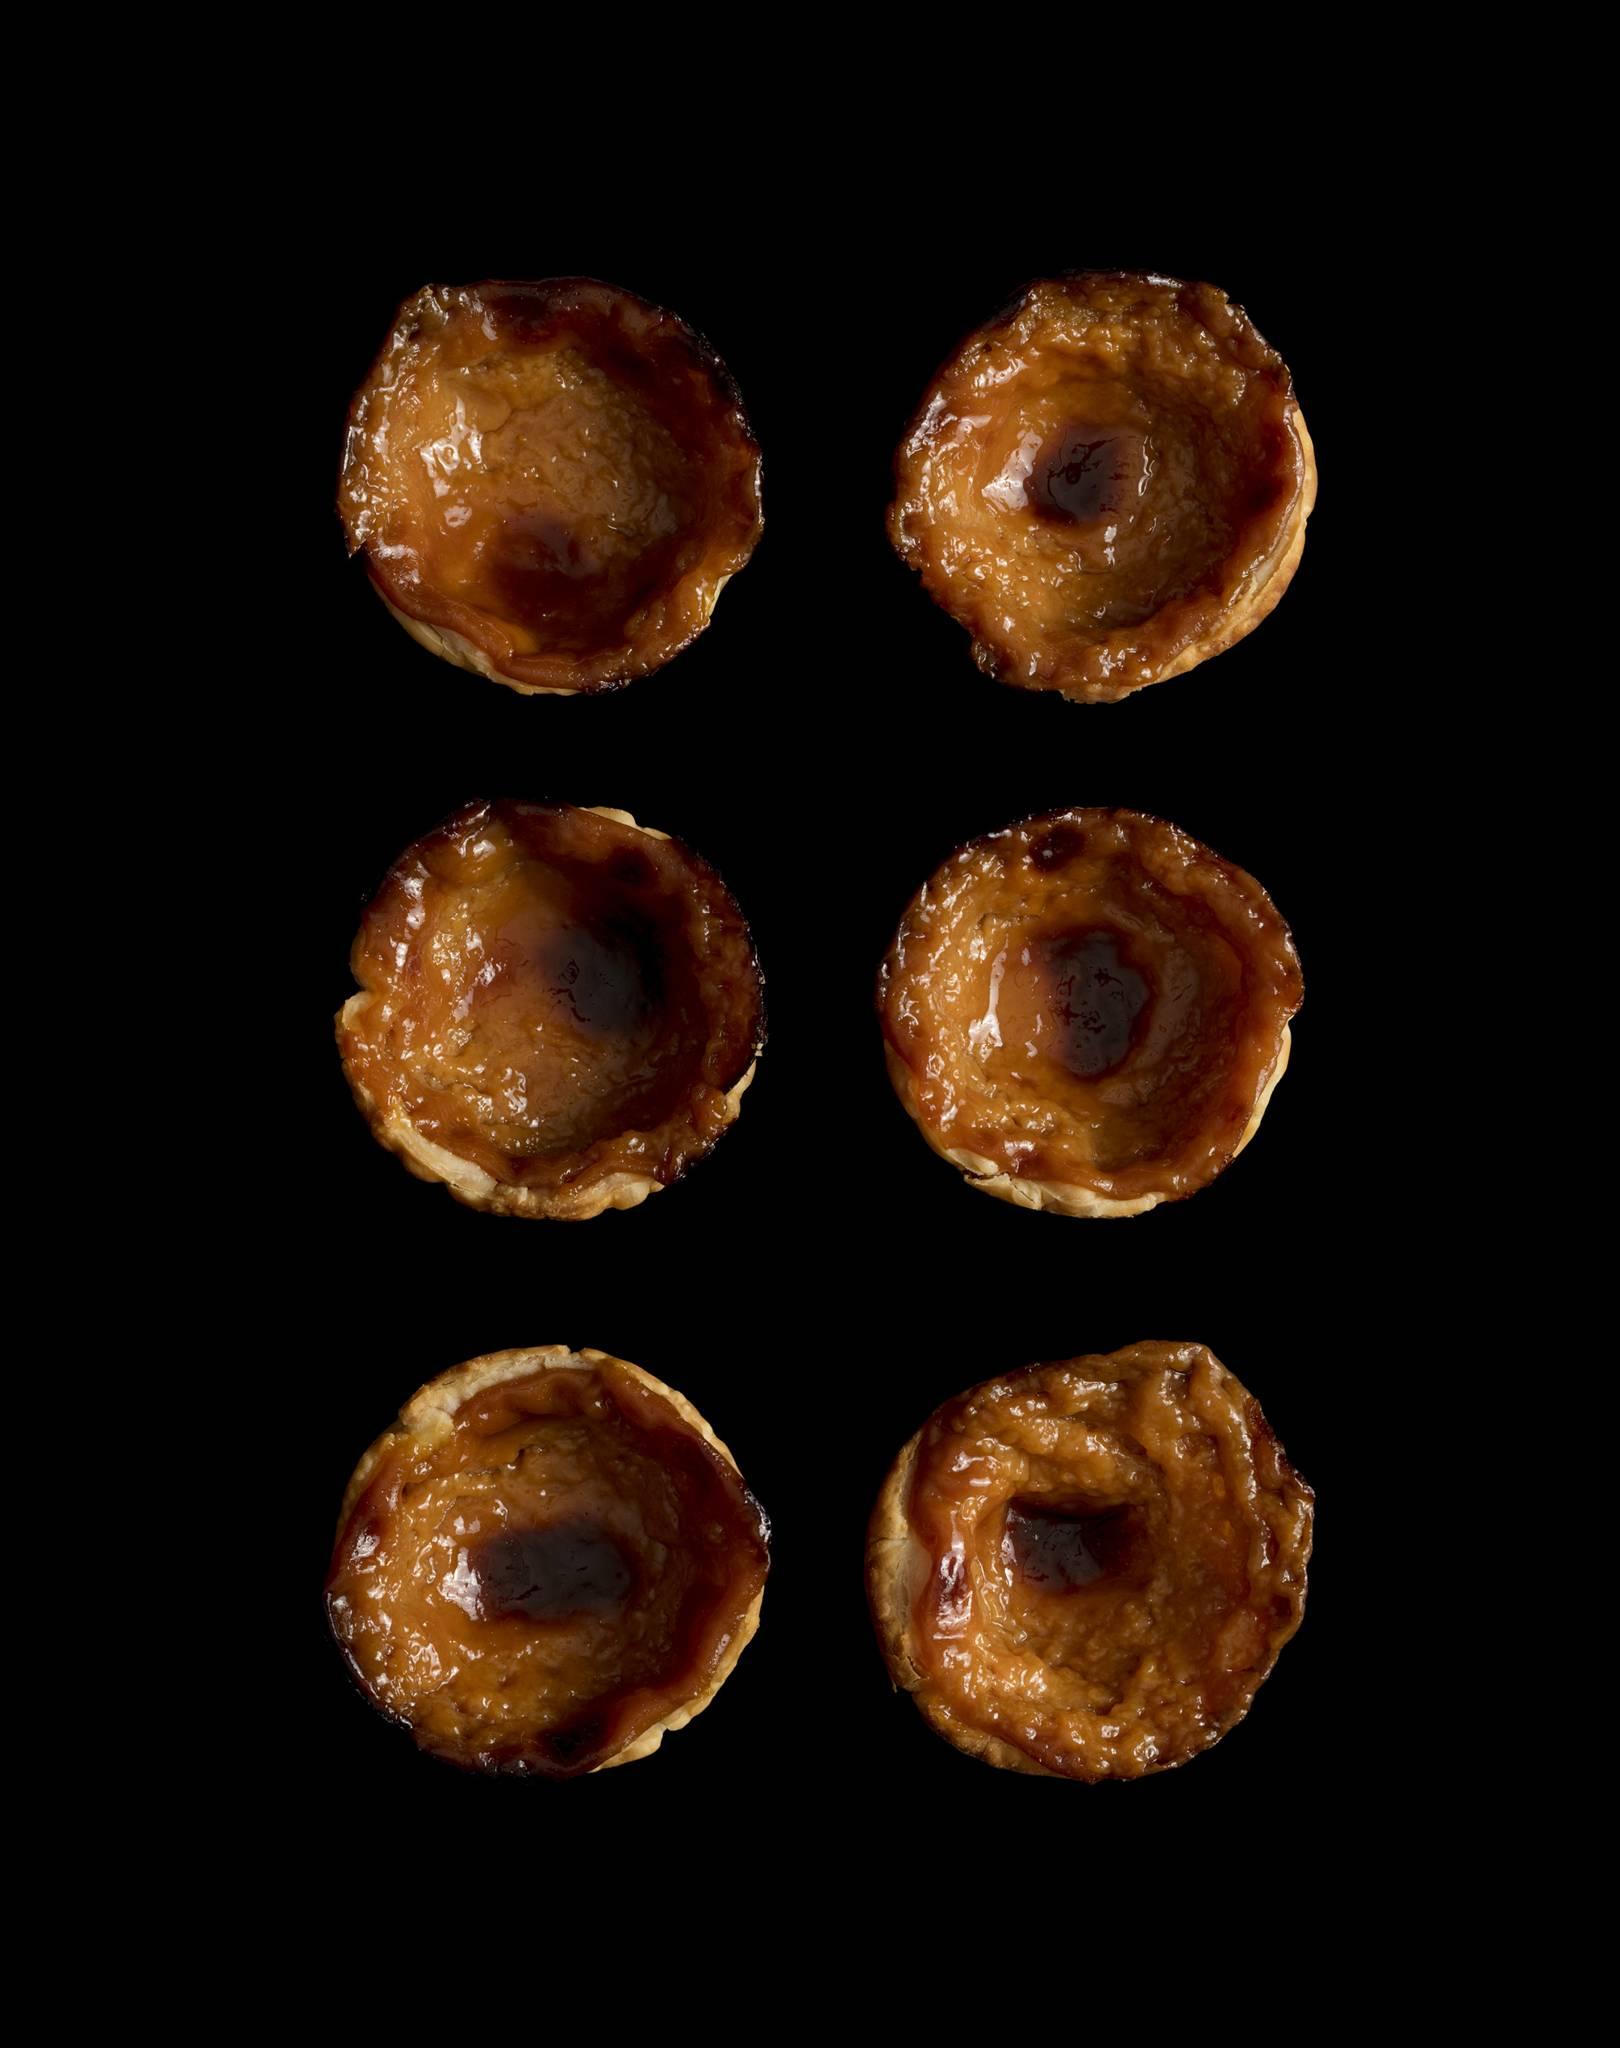 Nuno Mendes' Portuguese custard tarts (pastéis de nata)